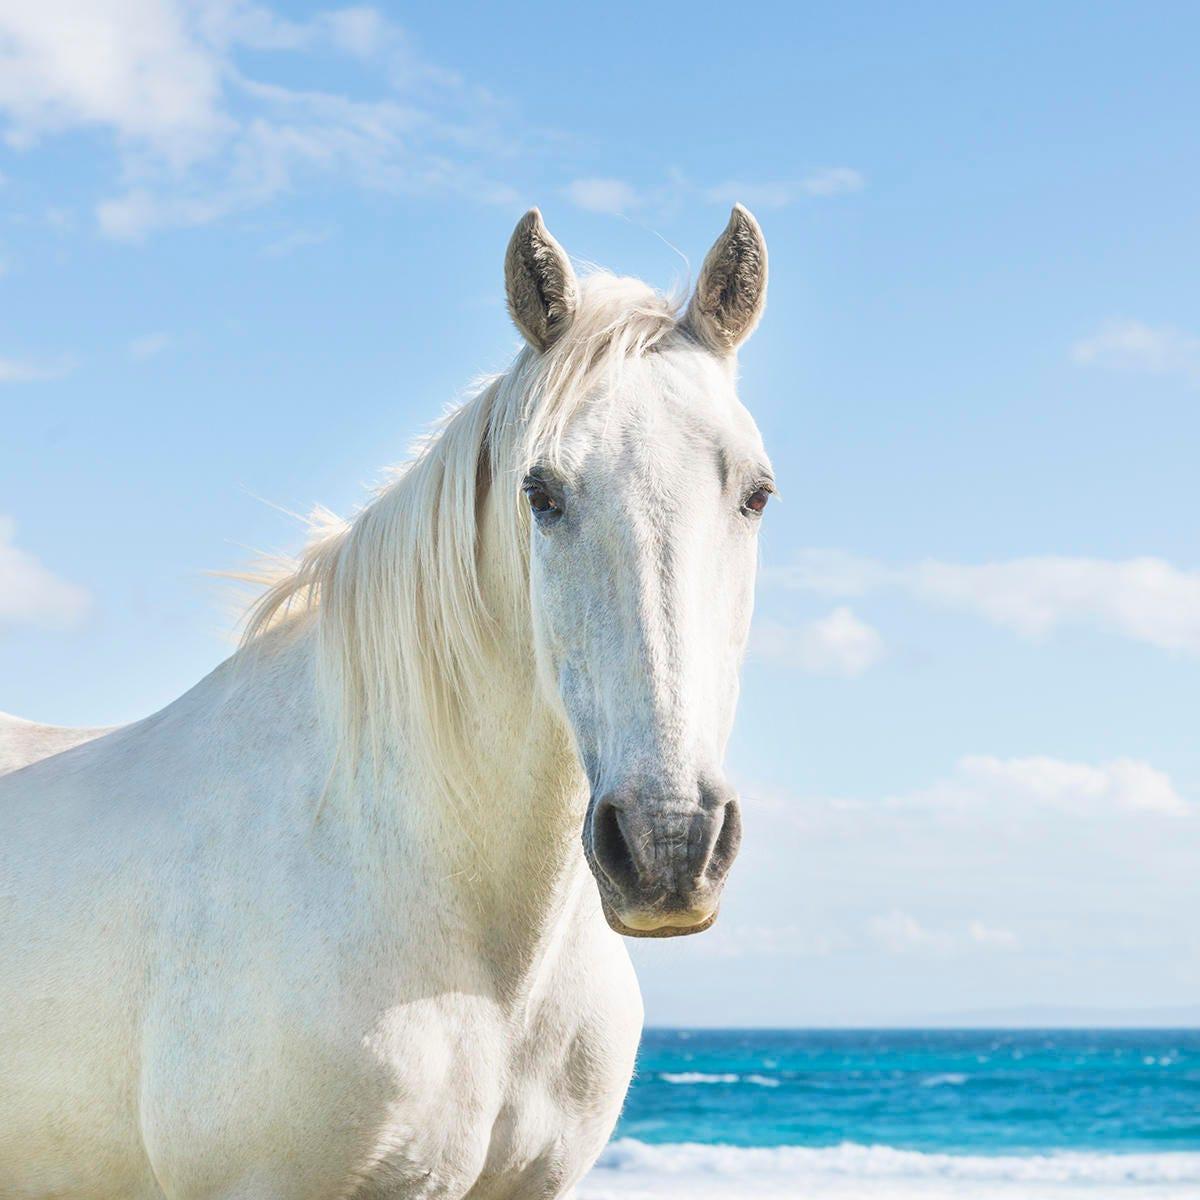 beach horses 3 spanish horse equine photography white horse